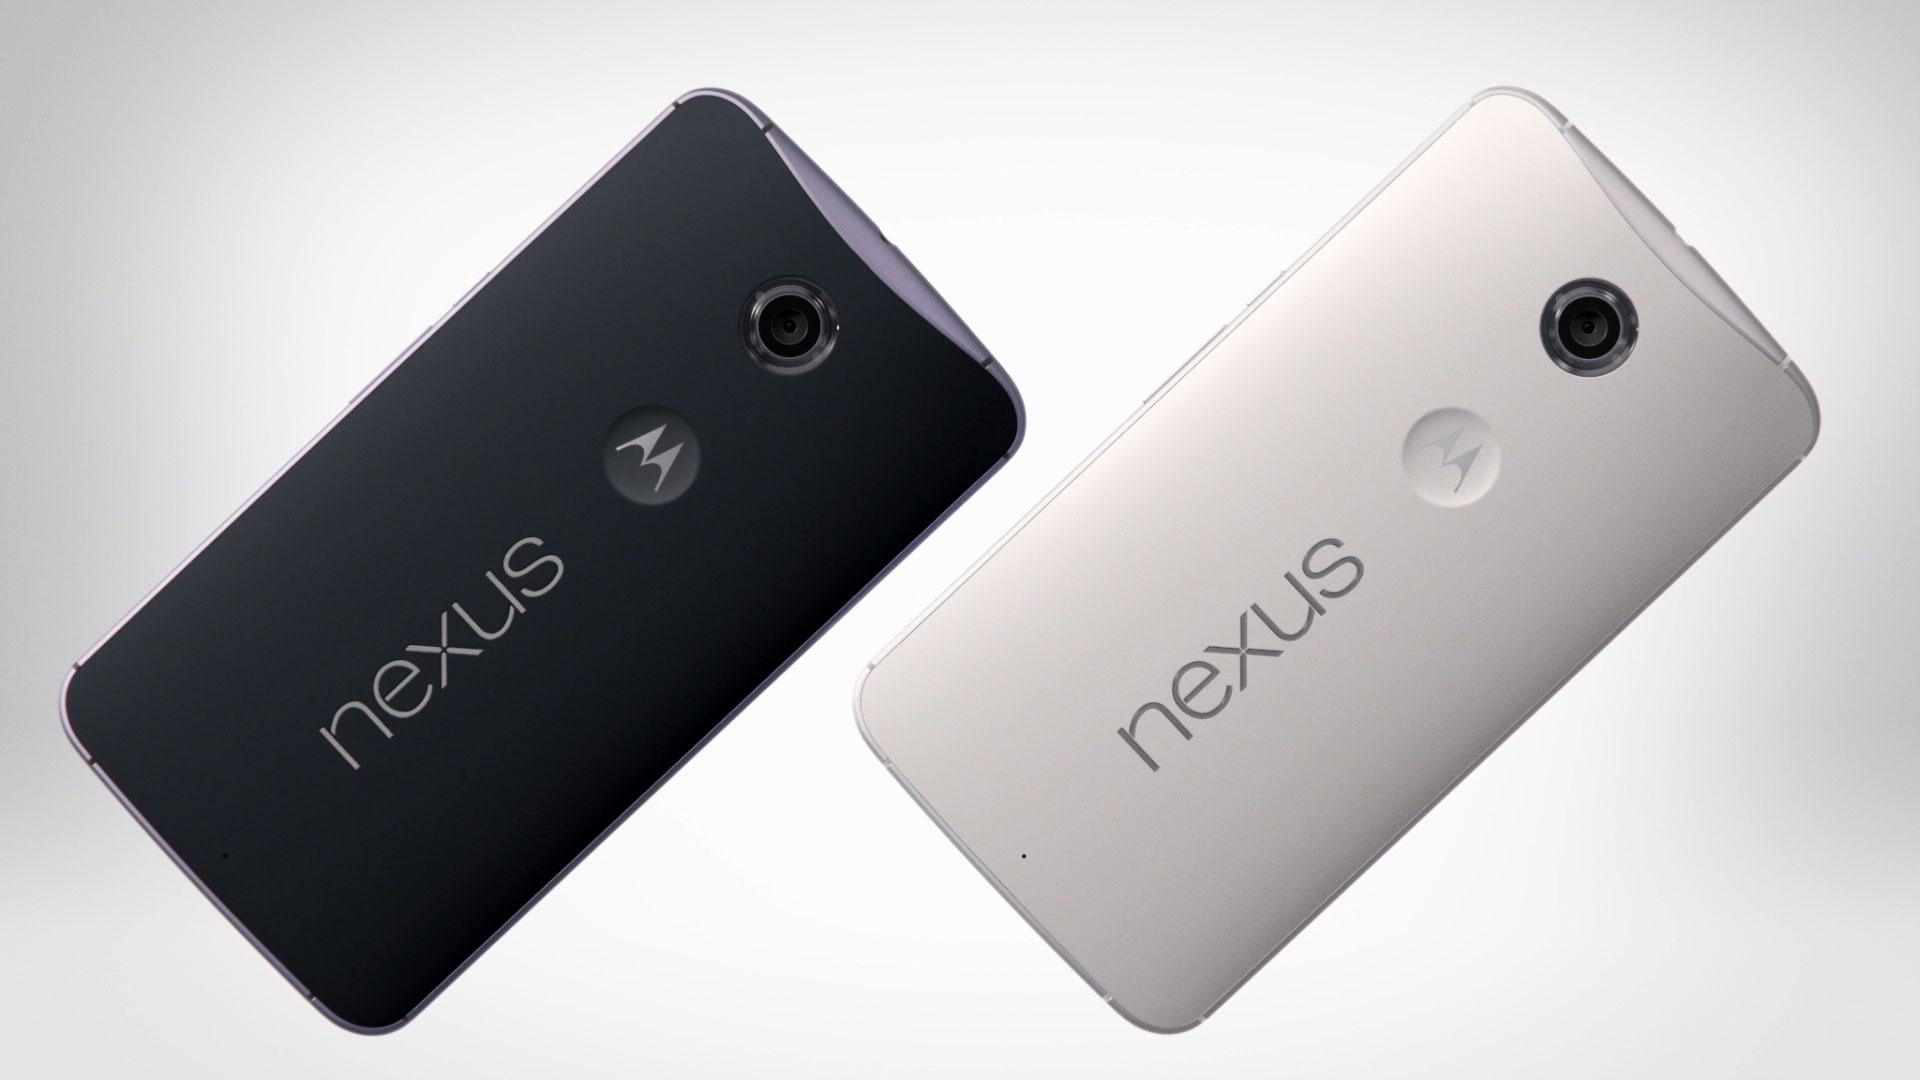 LG G4 versus Google Nexus 6 3